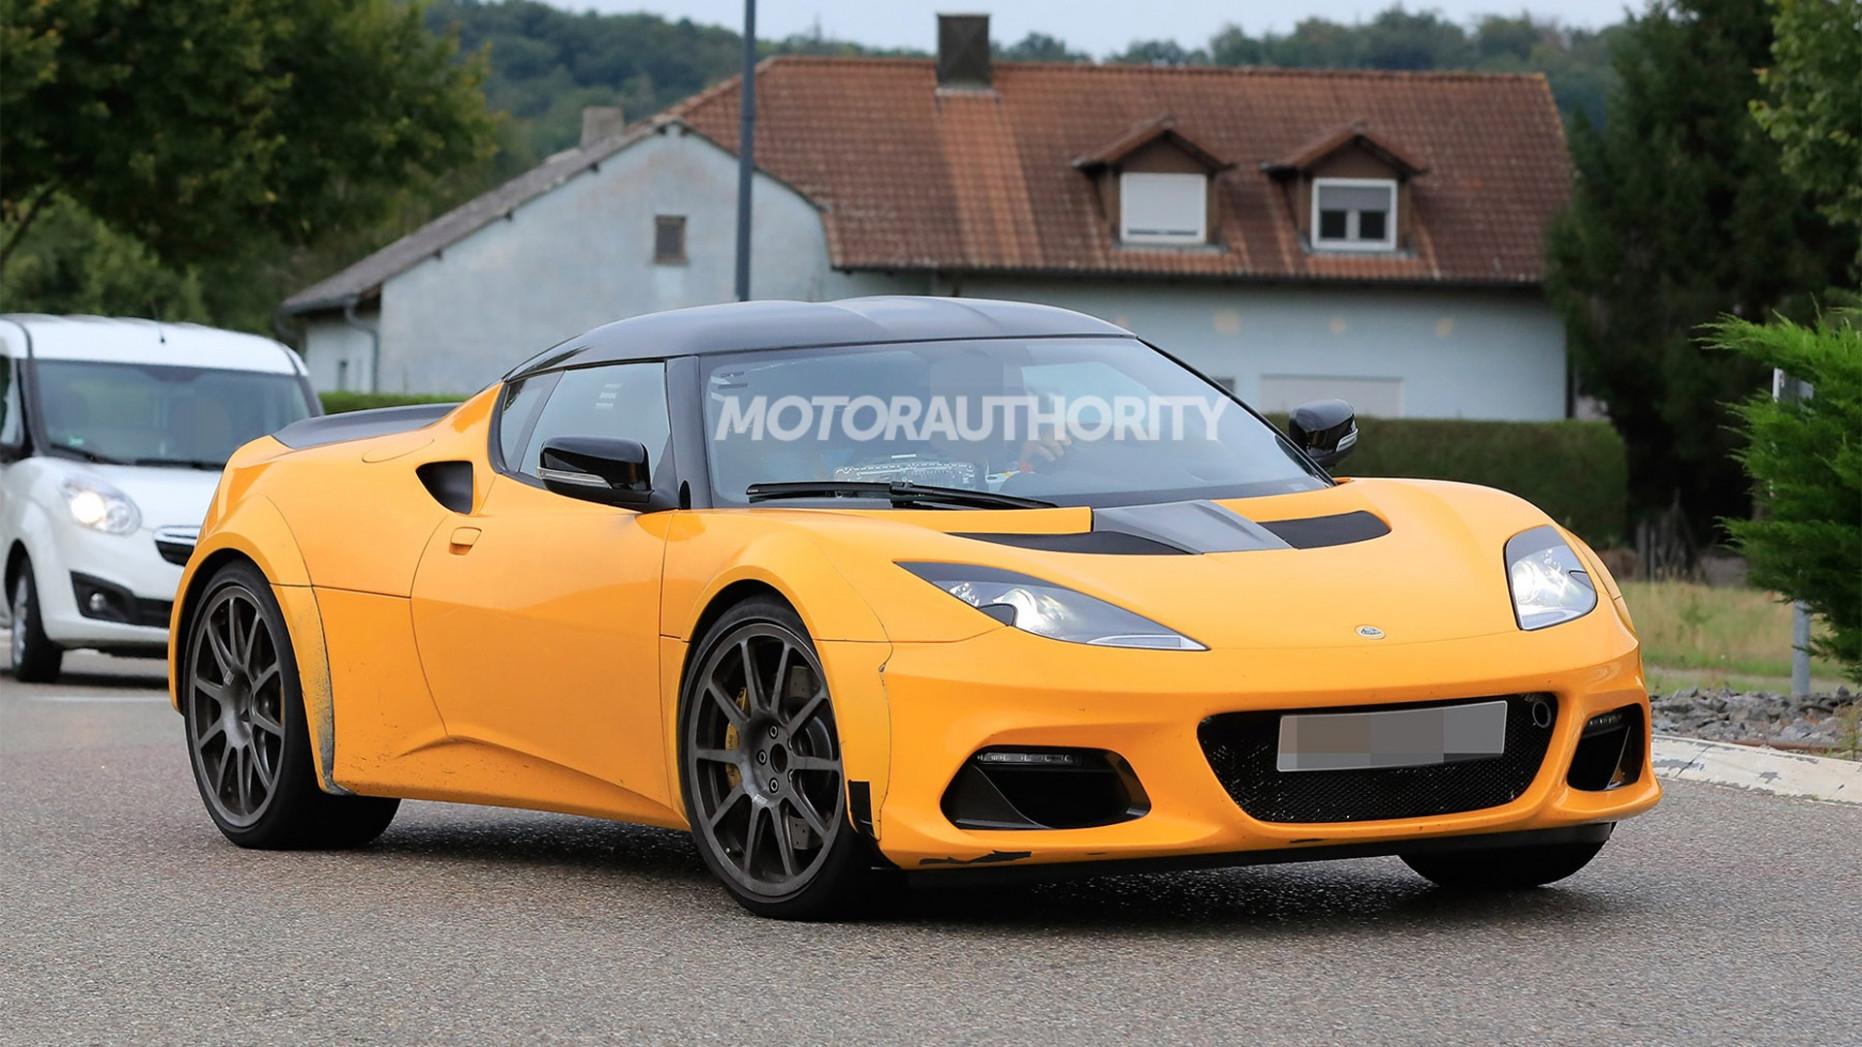 Review 2022 Lotus Evora